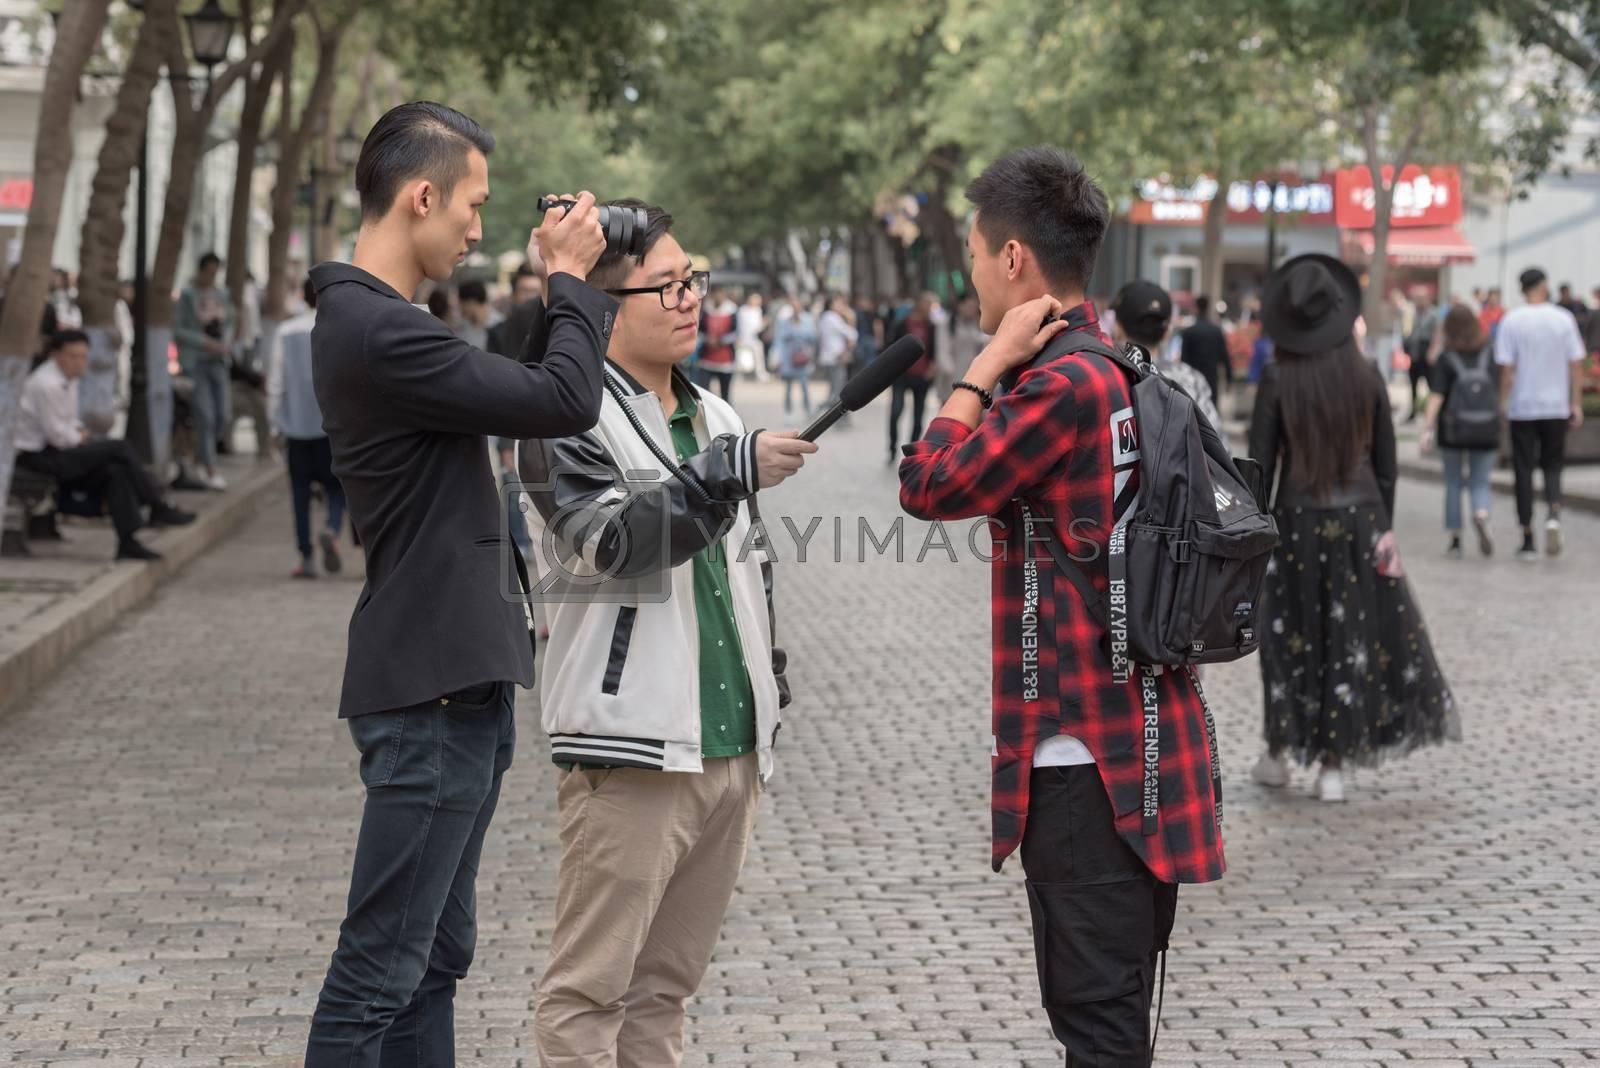 Harbin, Heilongjiang, China - September 2018: Filming interview. Blogger writes video report